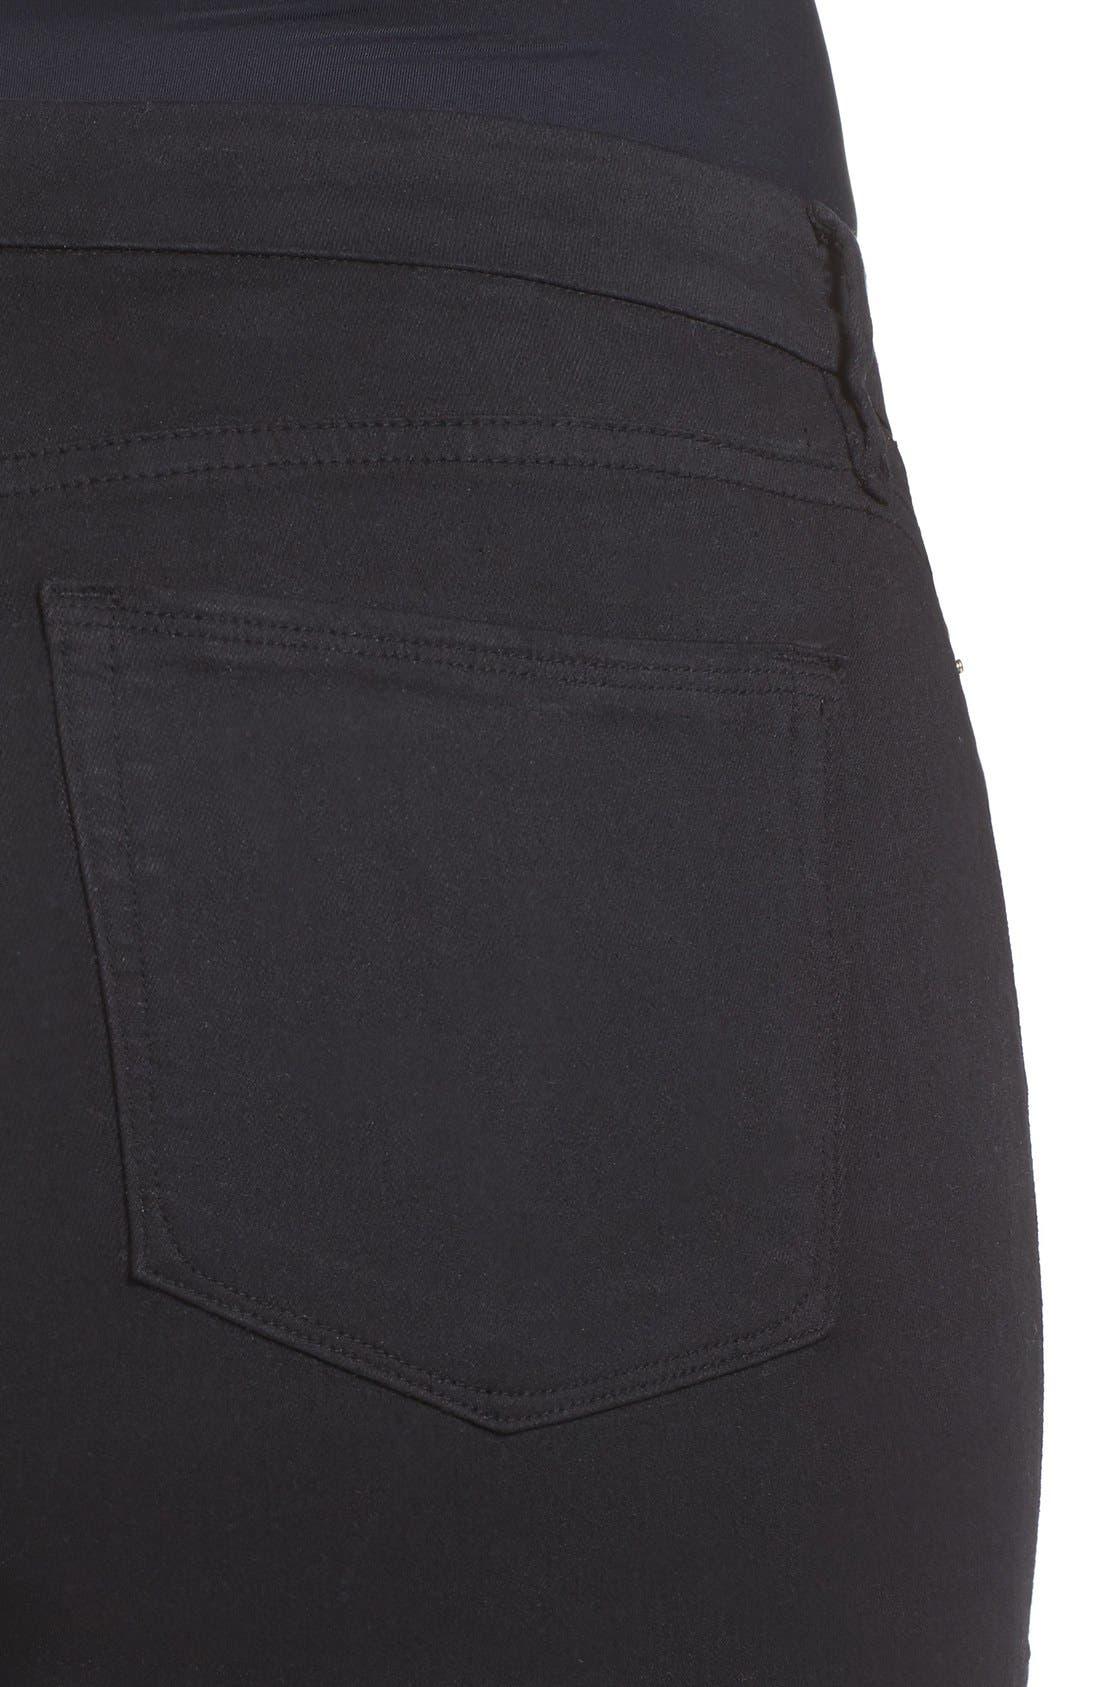 Good Legs High Rise Skinny Jeans,                             Alternate thumbnail 3, color,                             BLACK 001